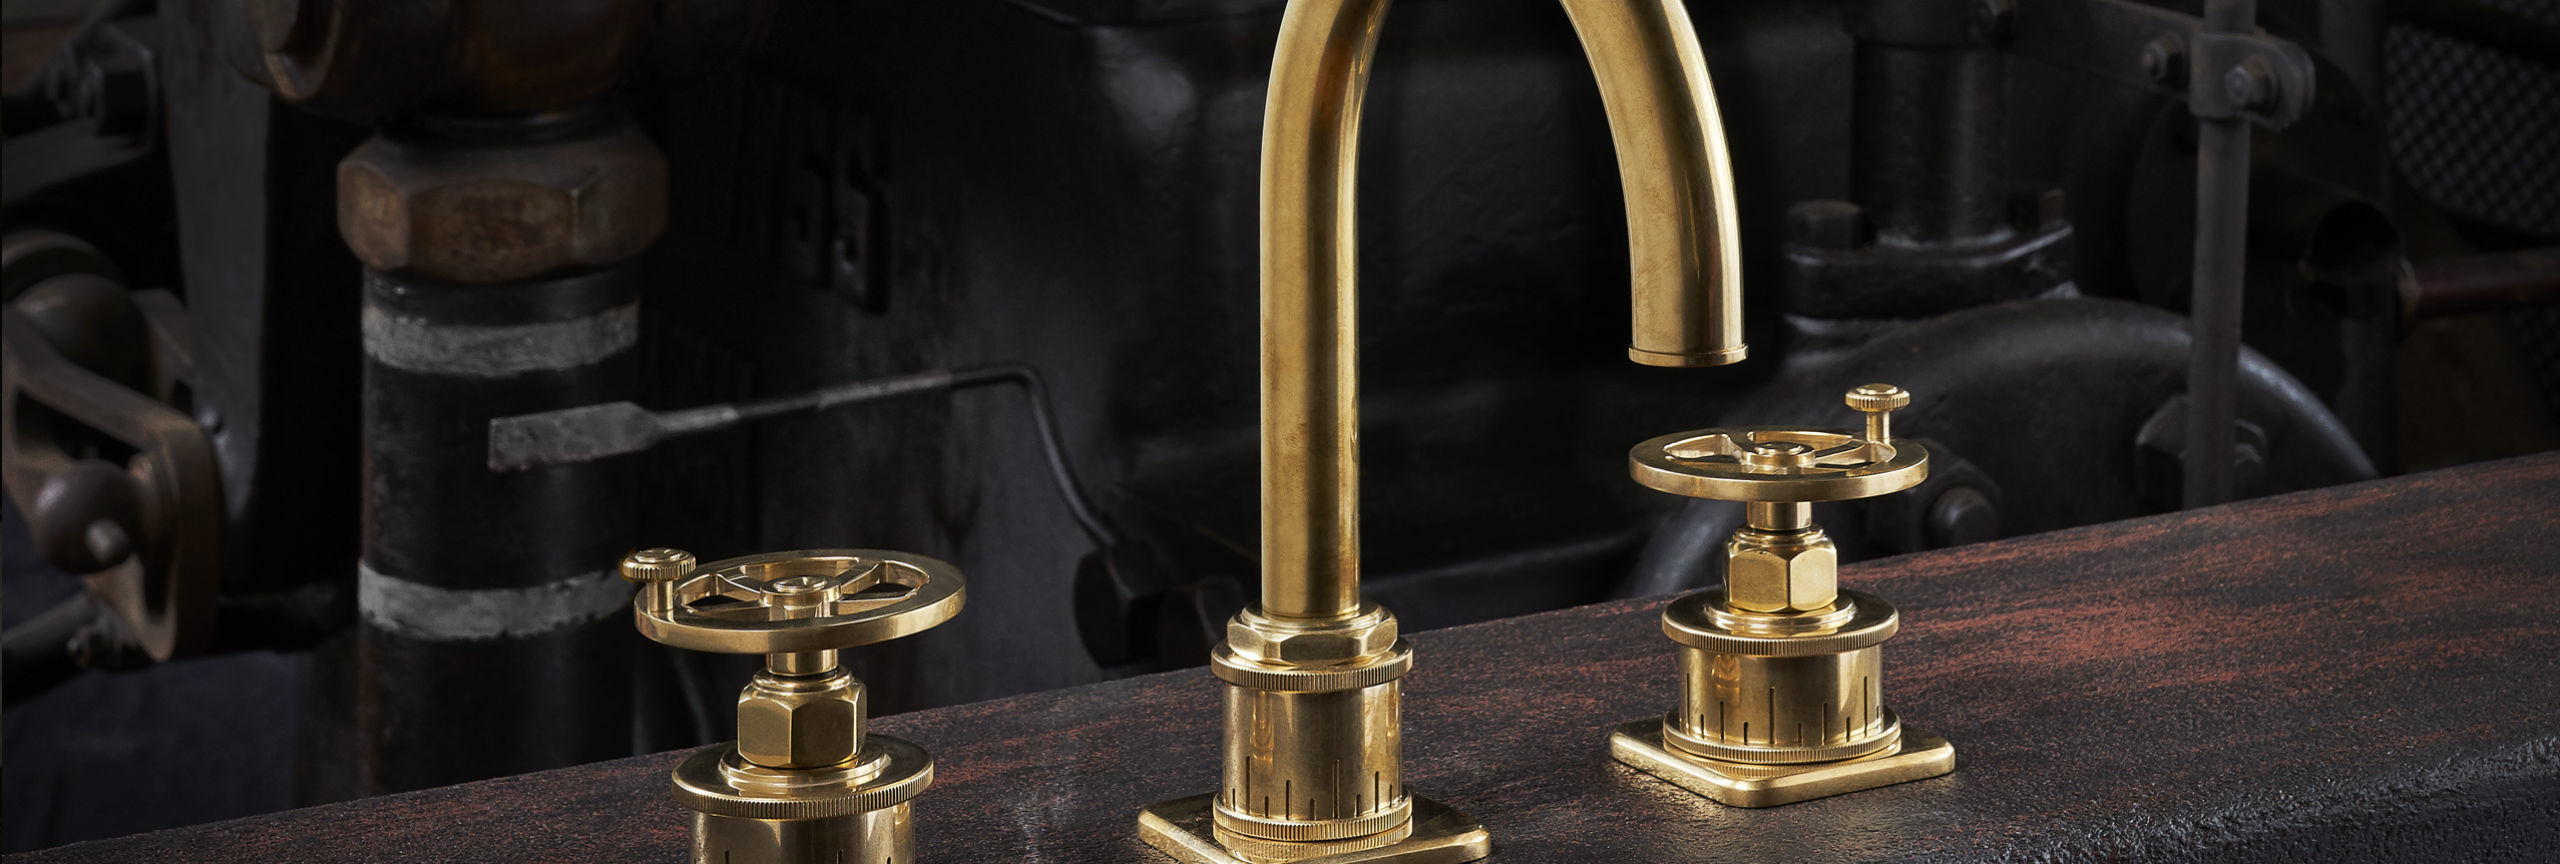 Bathroom series steampunk bay widespread faucet with wheel handles